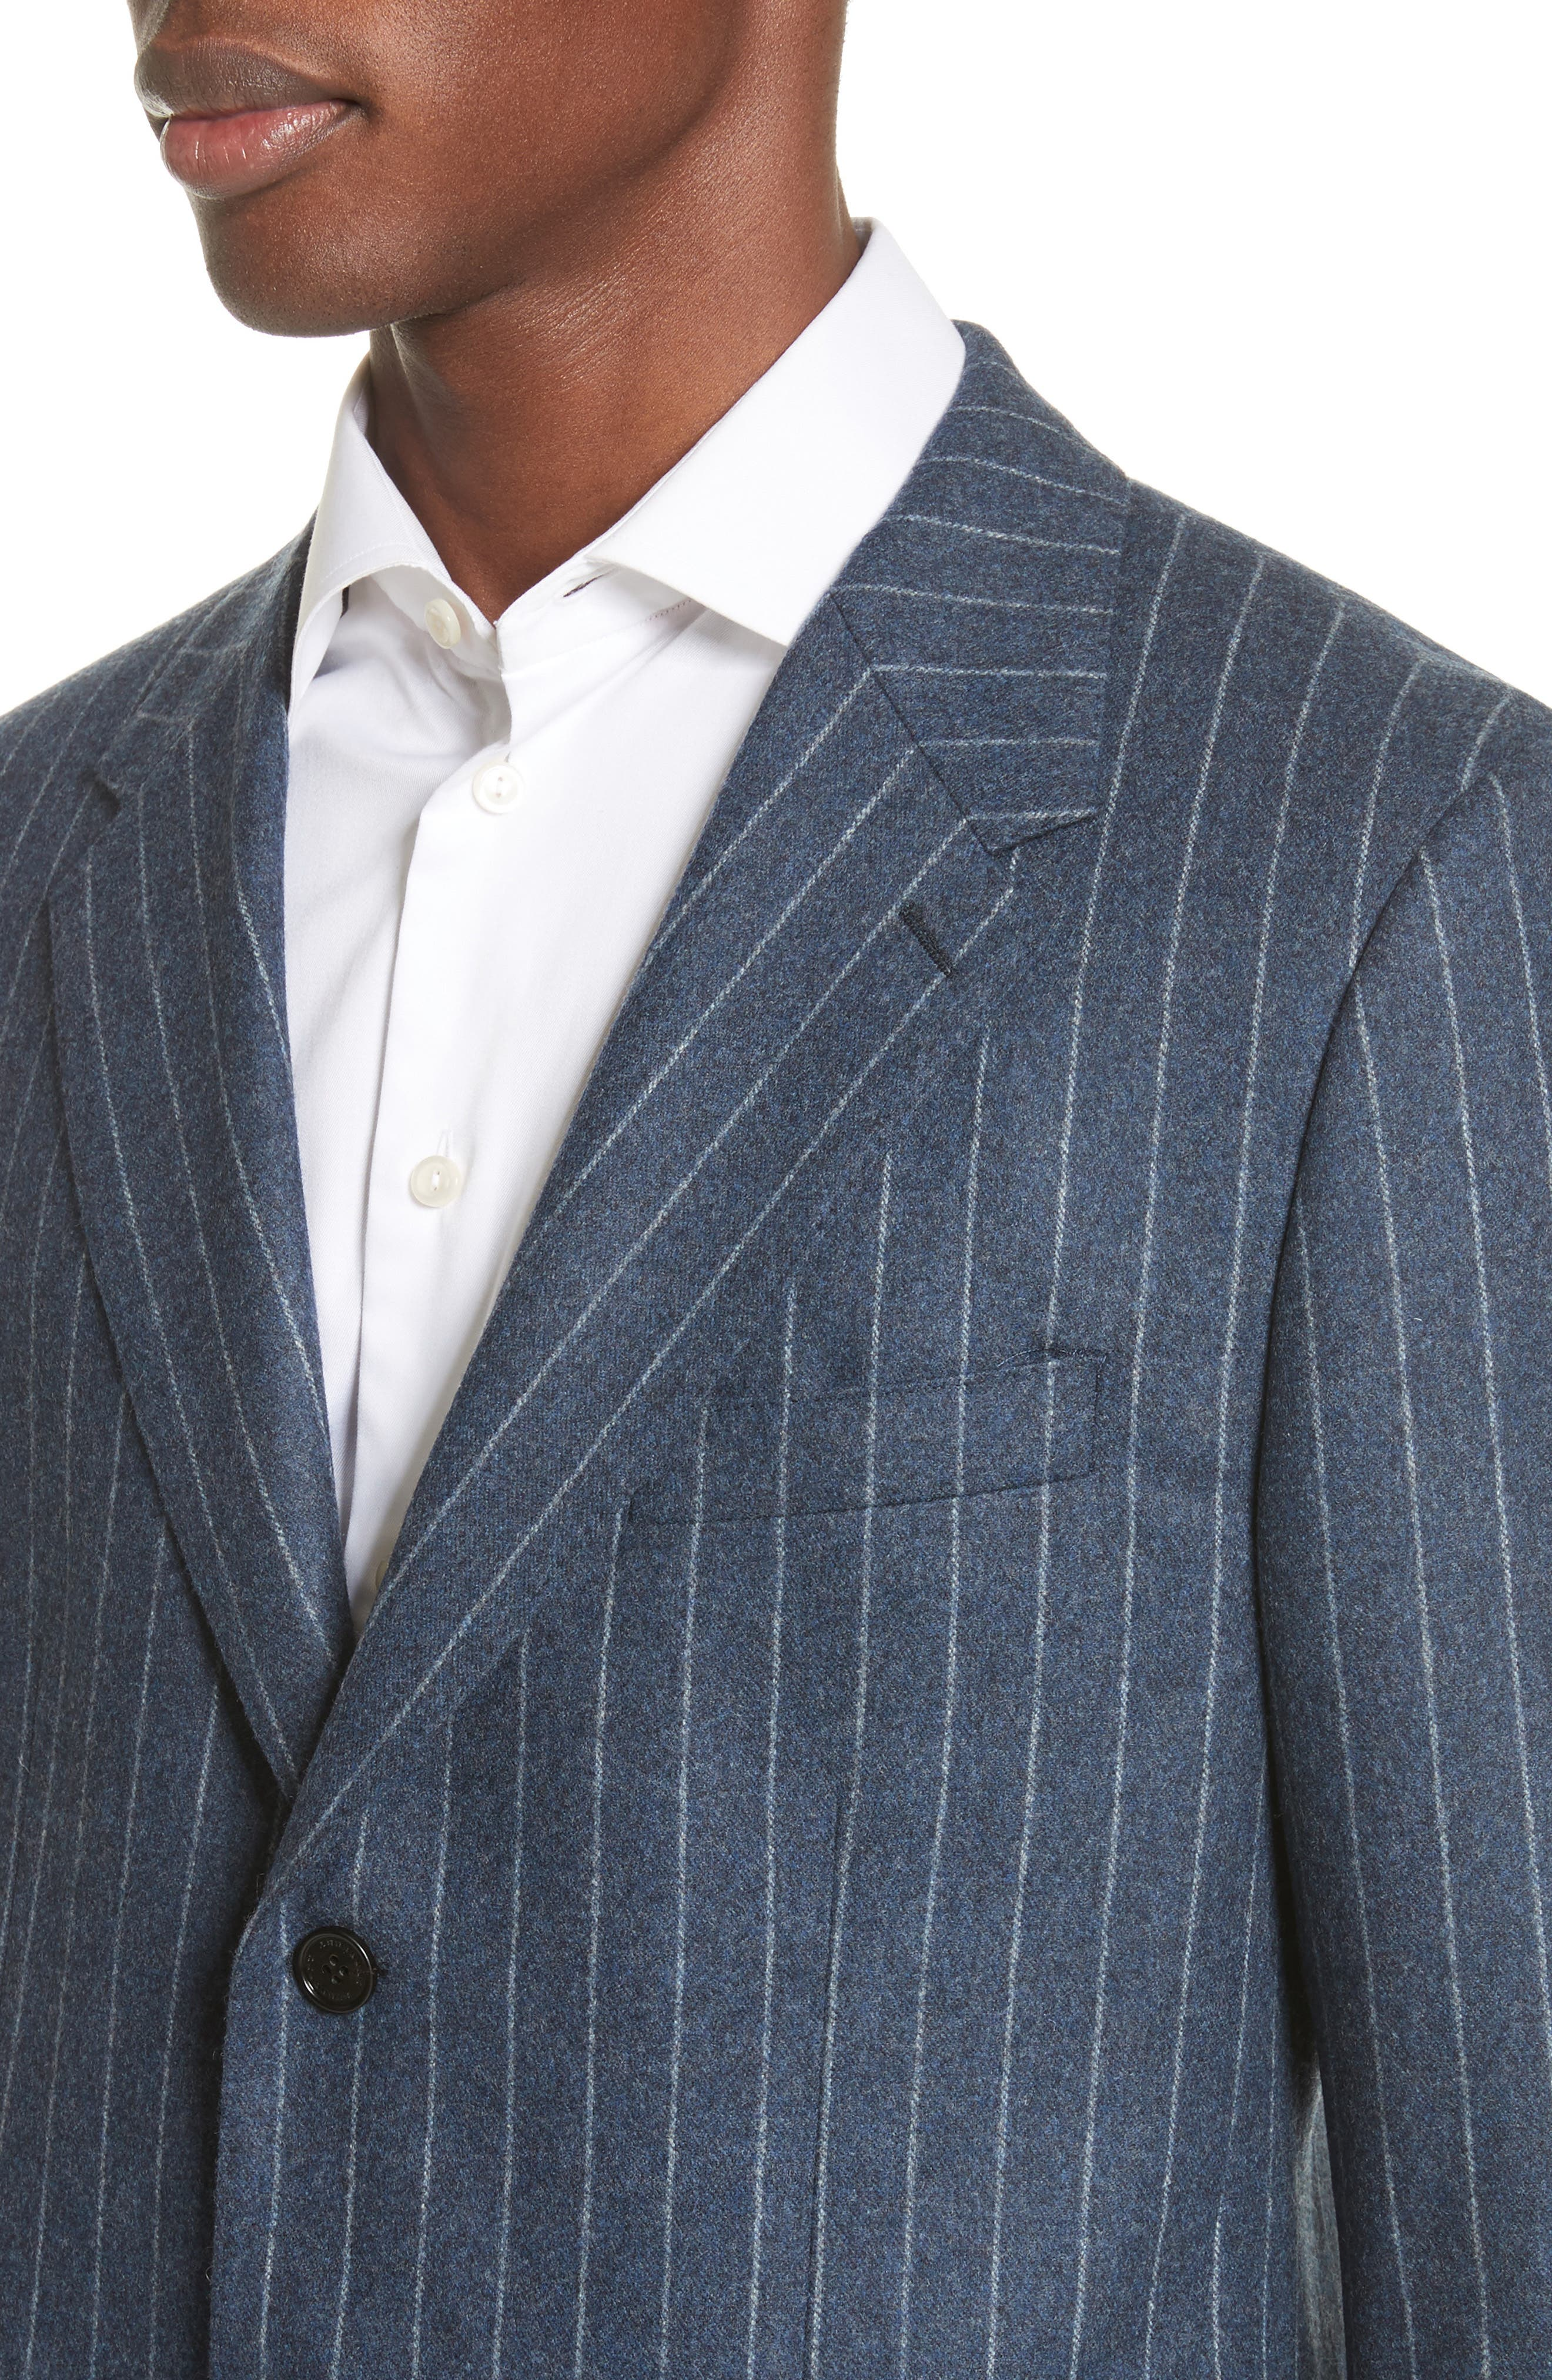 Trim Fit Wool Sport Coat,                             Alternate thumbnail 4, color,